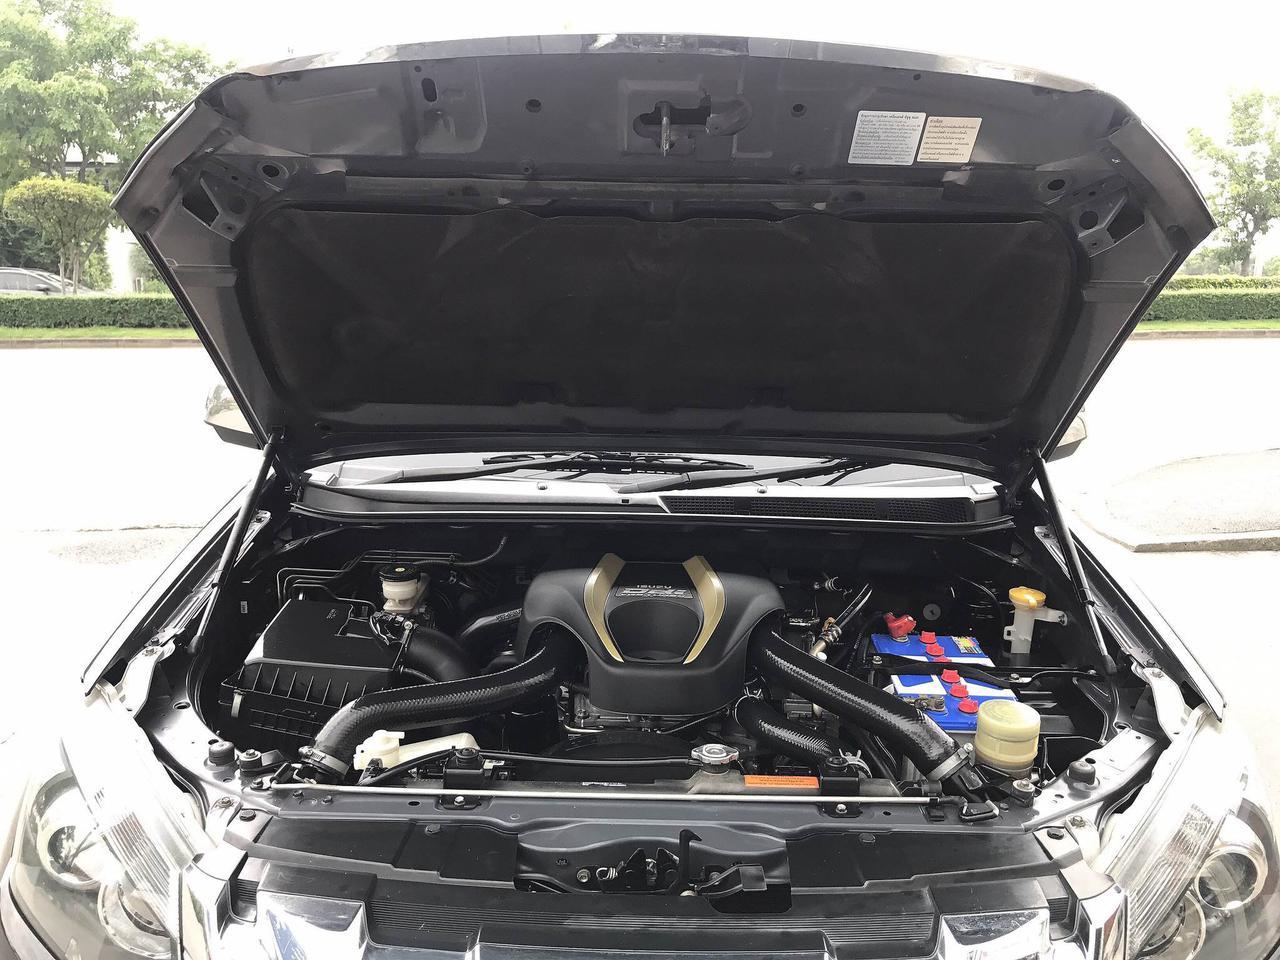 ISUZU DMAX V-CROSS 3.0 CAB4TOP 4x4 AUTO ปี2012 รถบ้านมือเดียวไม่มีชนสวย น็อตไม่มีแกะ รูปที่ 6